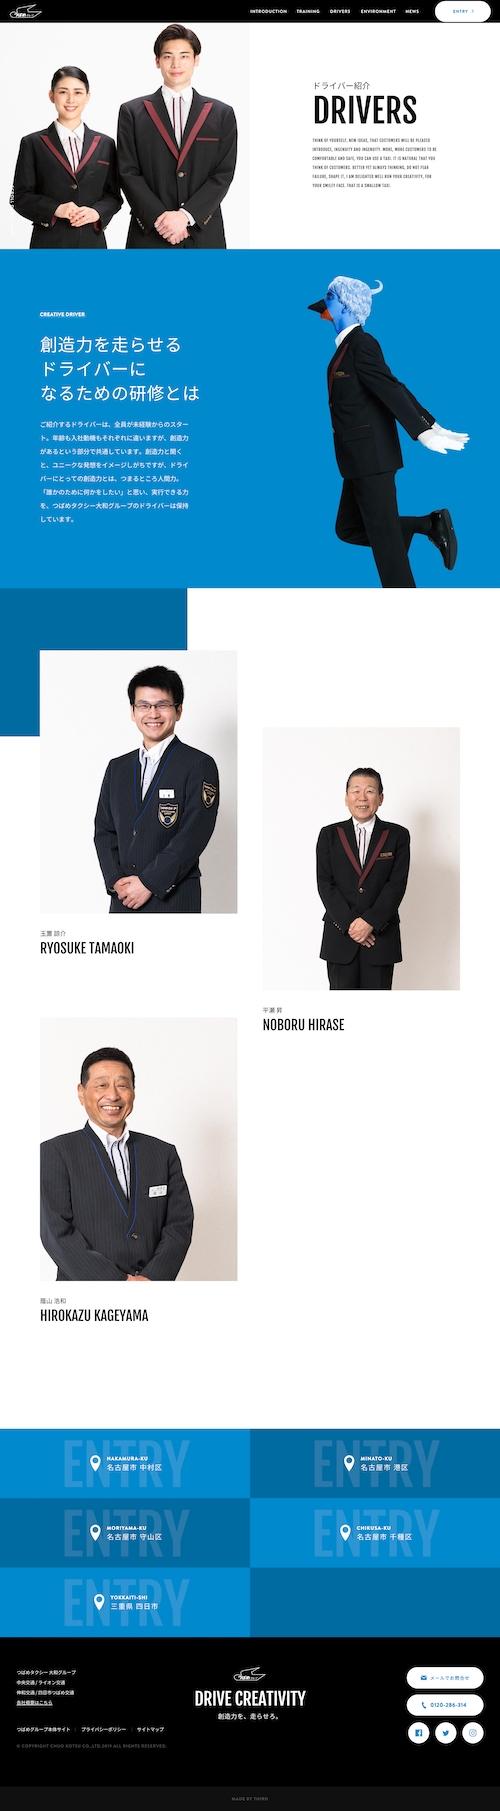 tsubametaxi-yamato-drivers